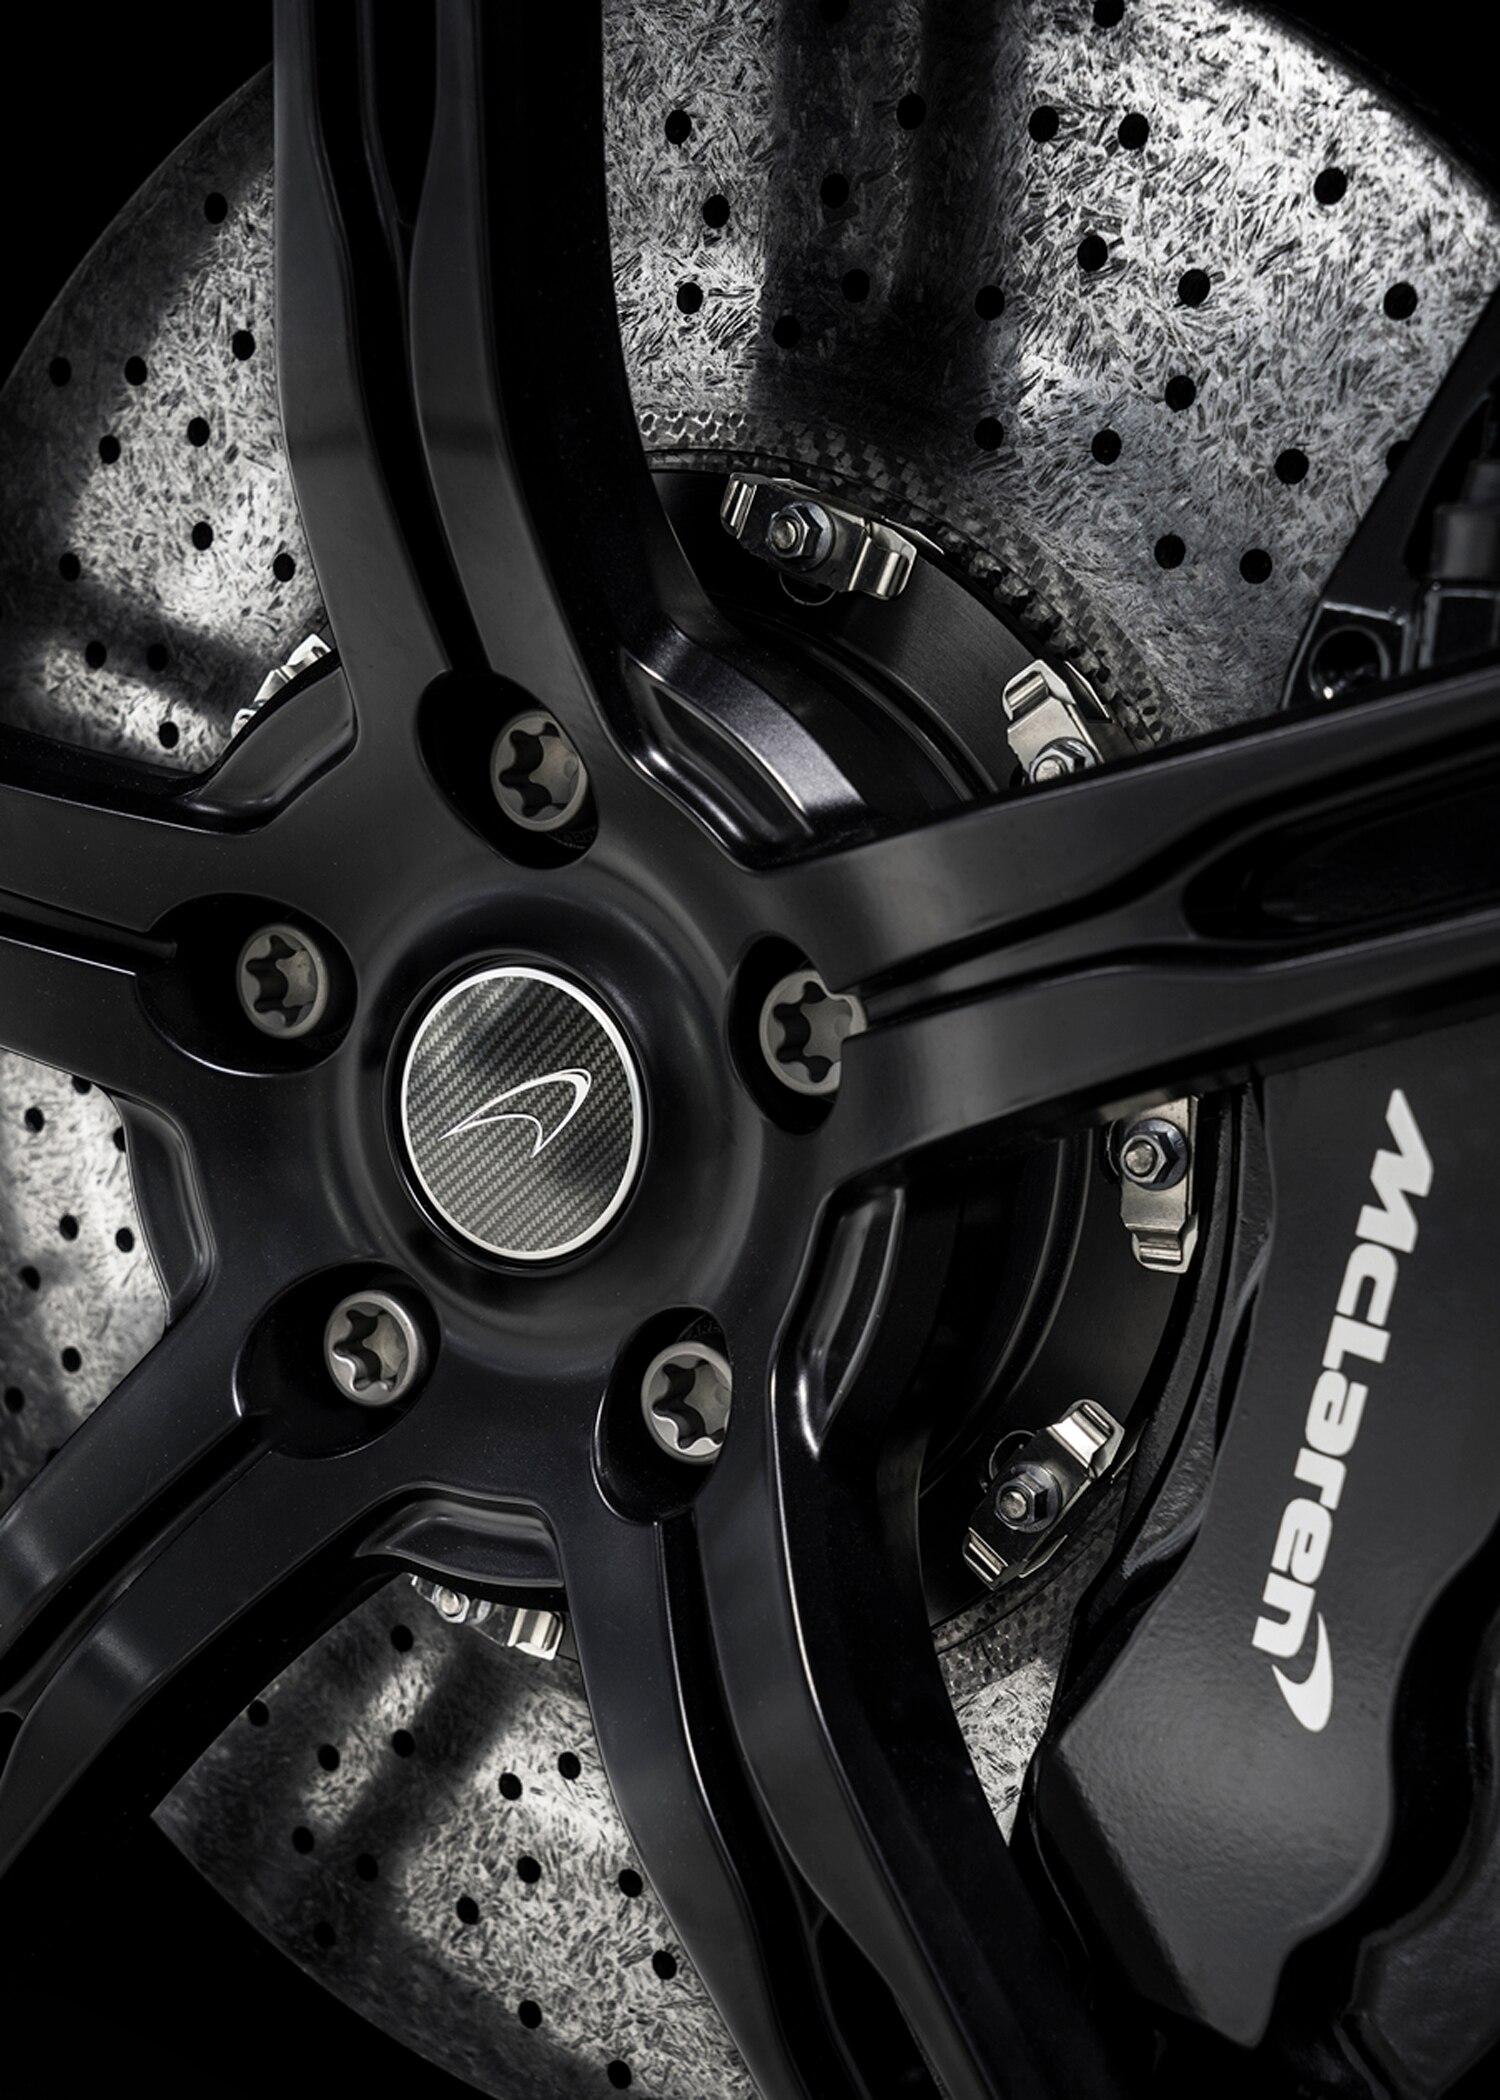 https://st.automobilemag.com/uploads/sites/11/2014/04/mclaren-mso-650s-coupe-concept-7-wheel.jpg